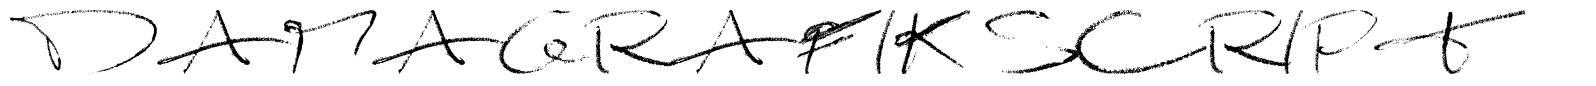 Damagrafik Script font